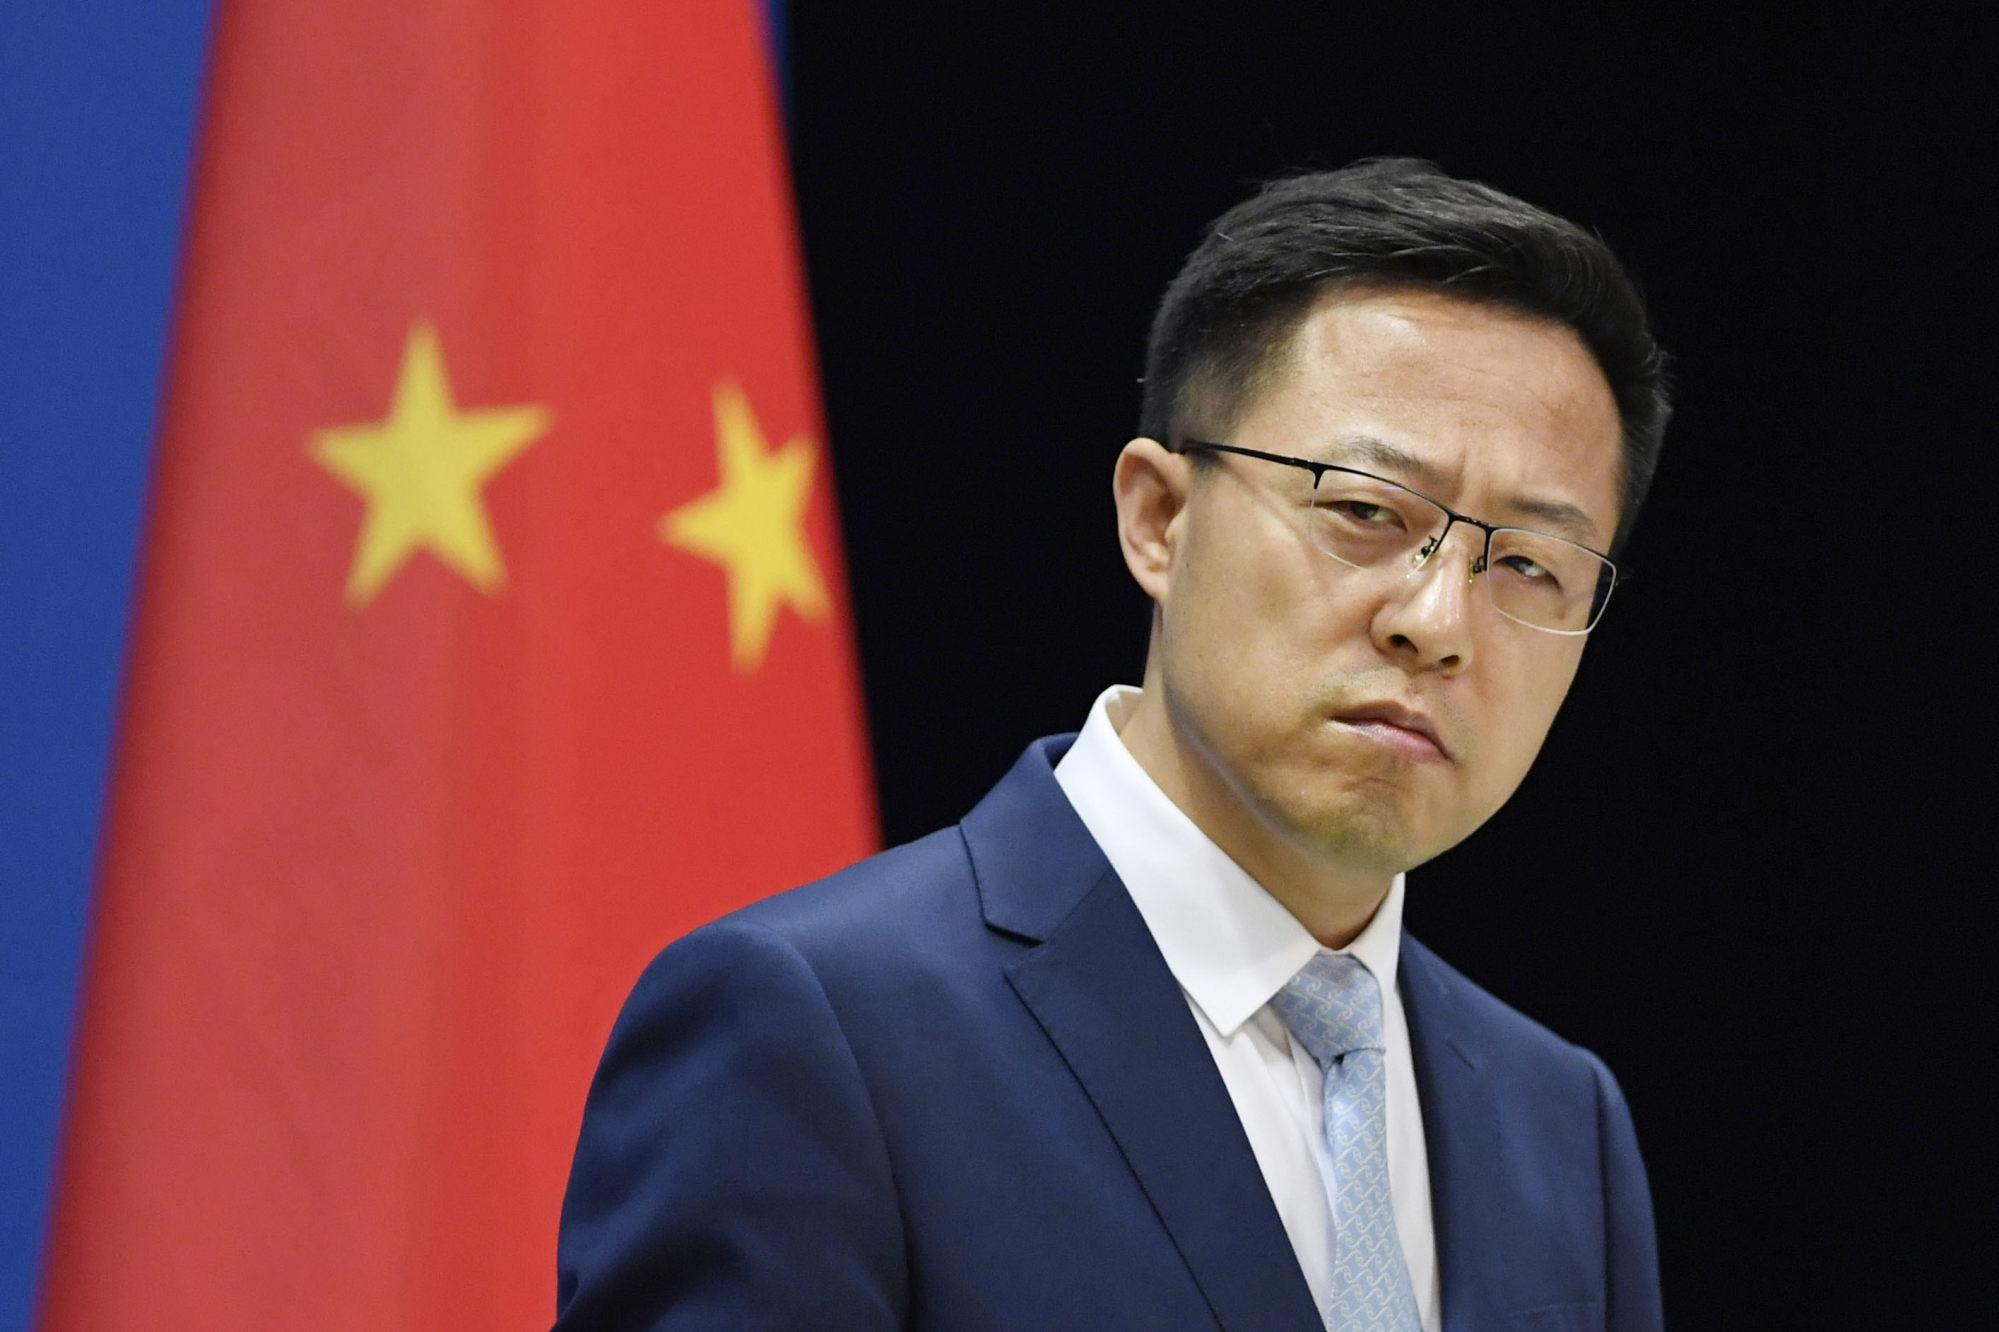 Chinese Foreign Ministry spokesman Zhao Lijian. Photo: Kyodo